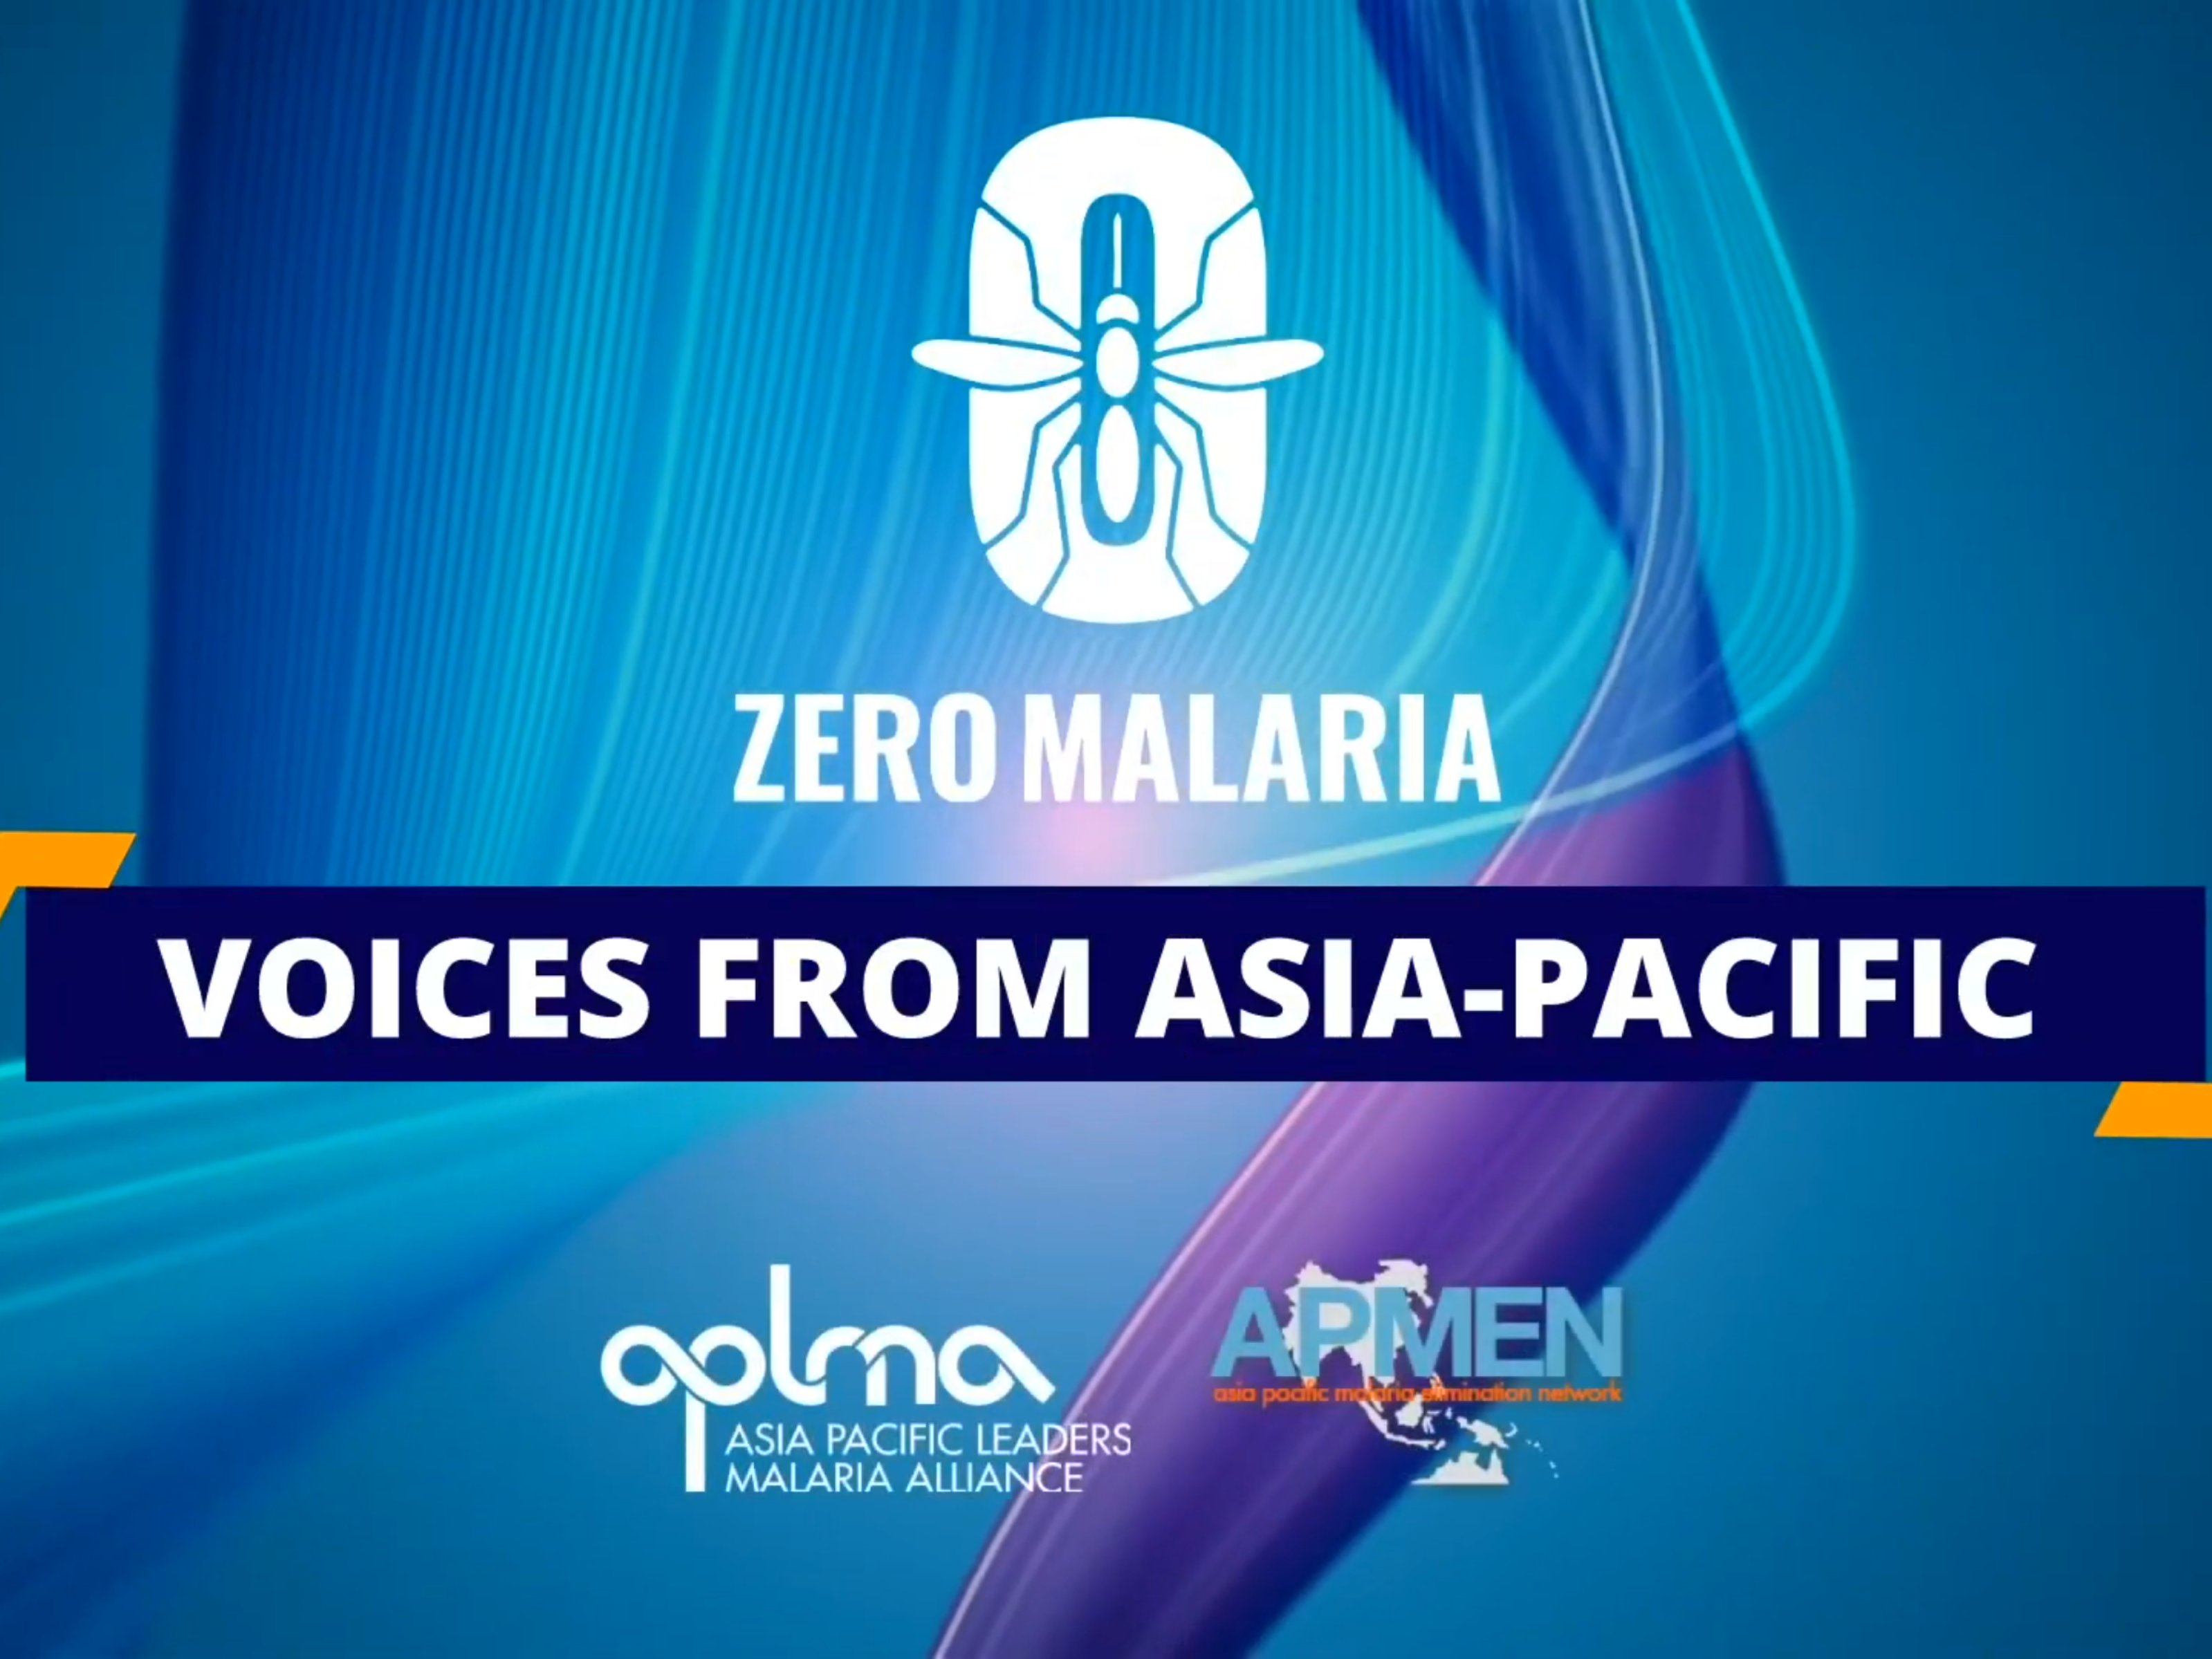 Zero Malaria